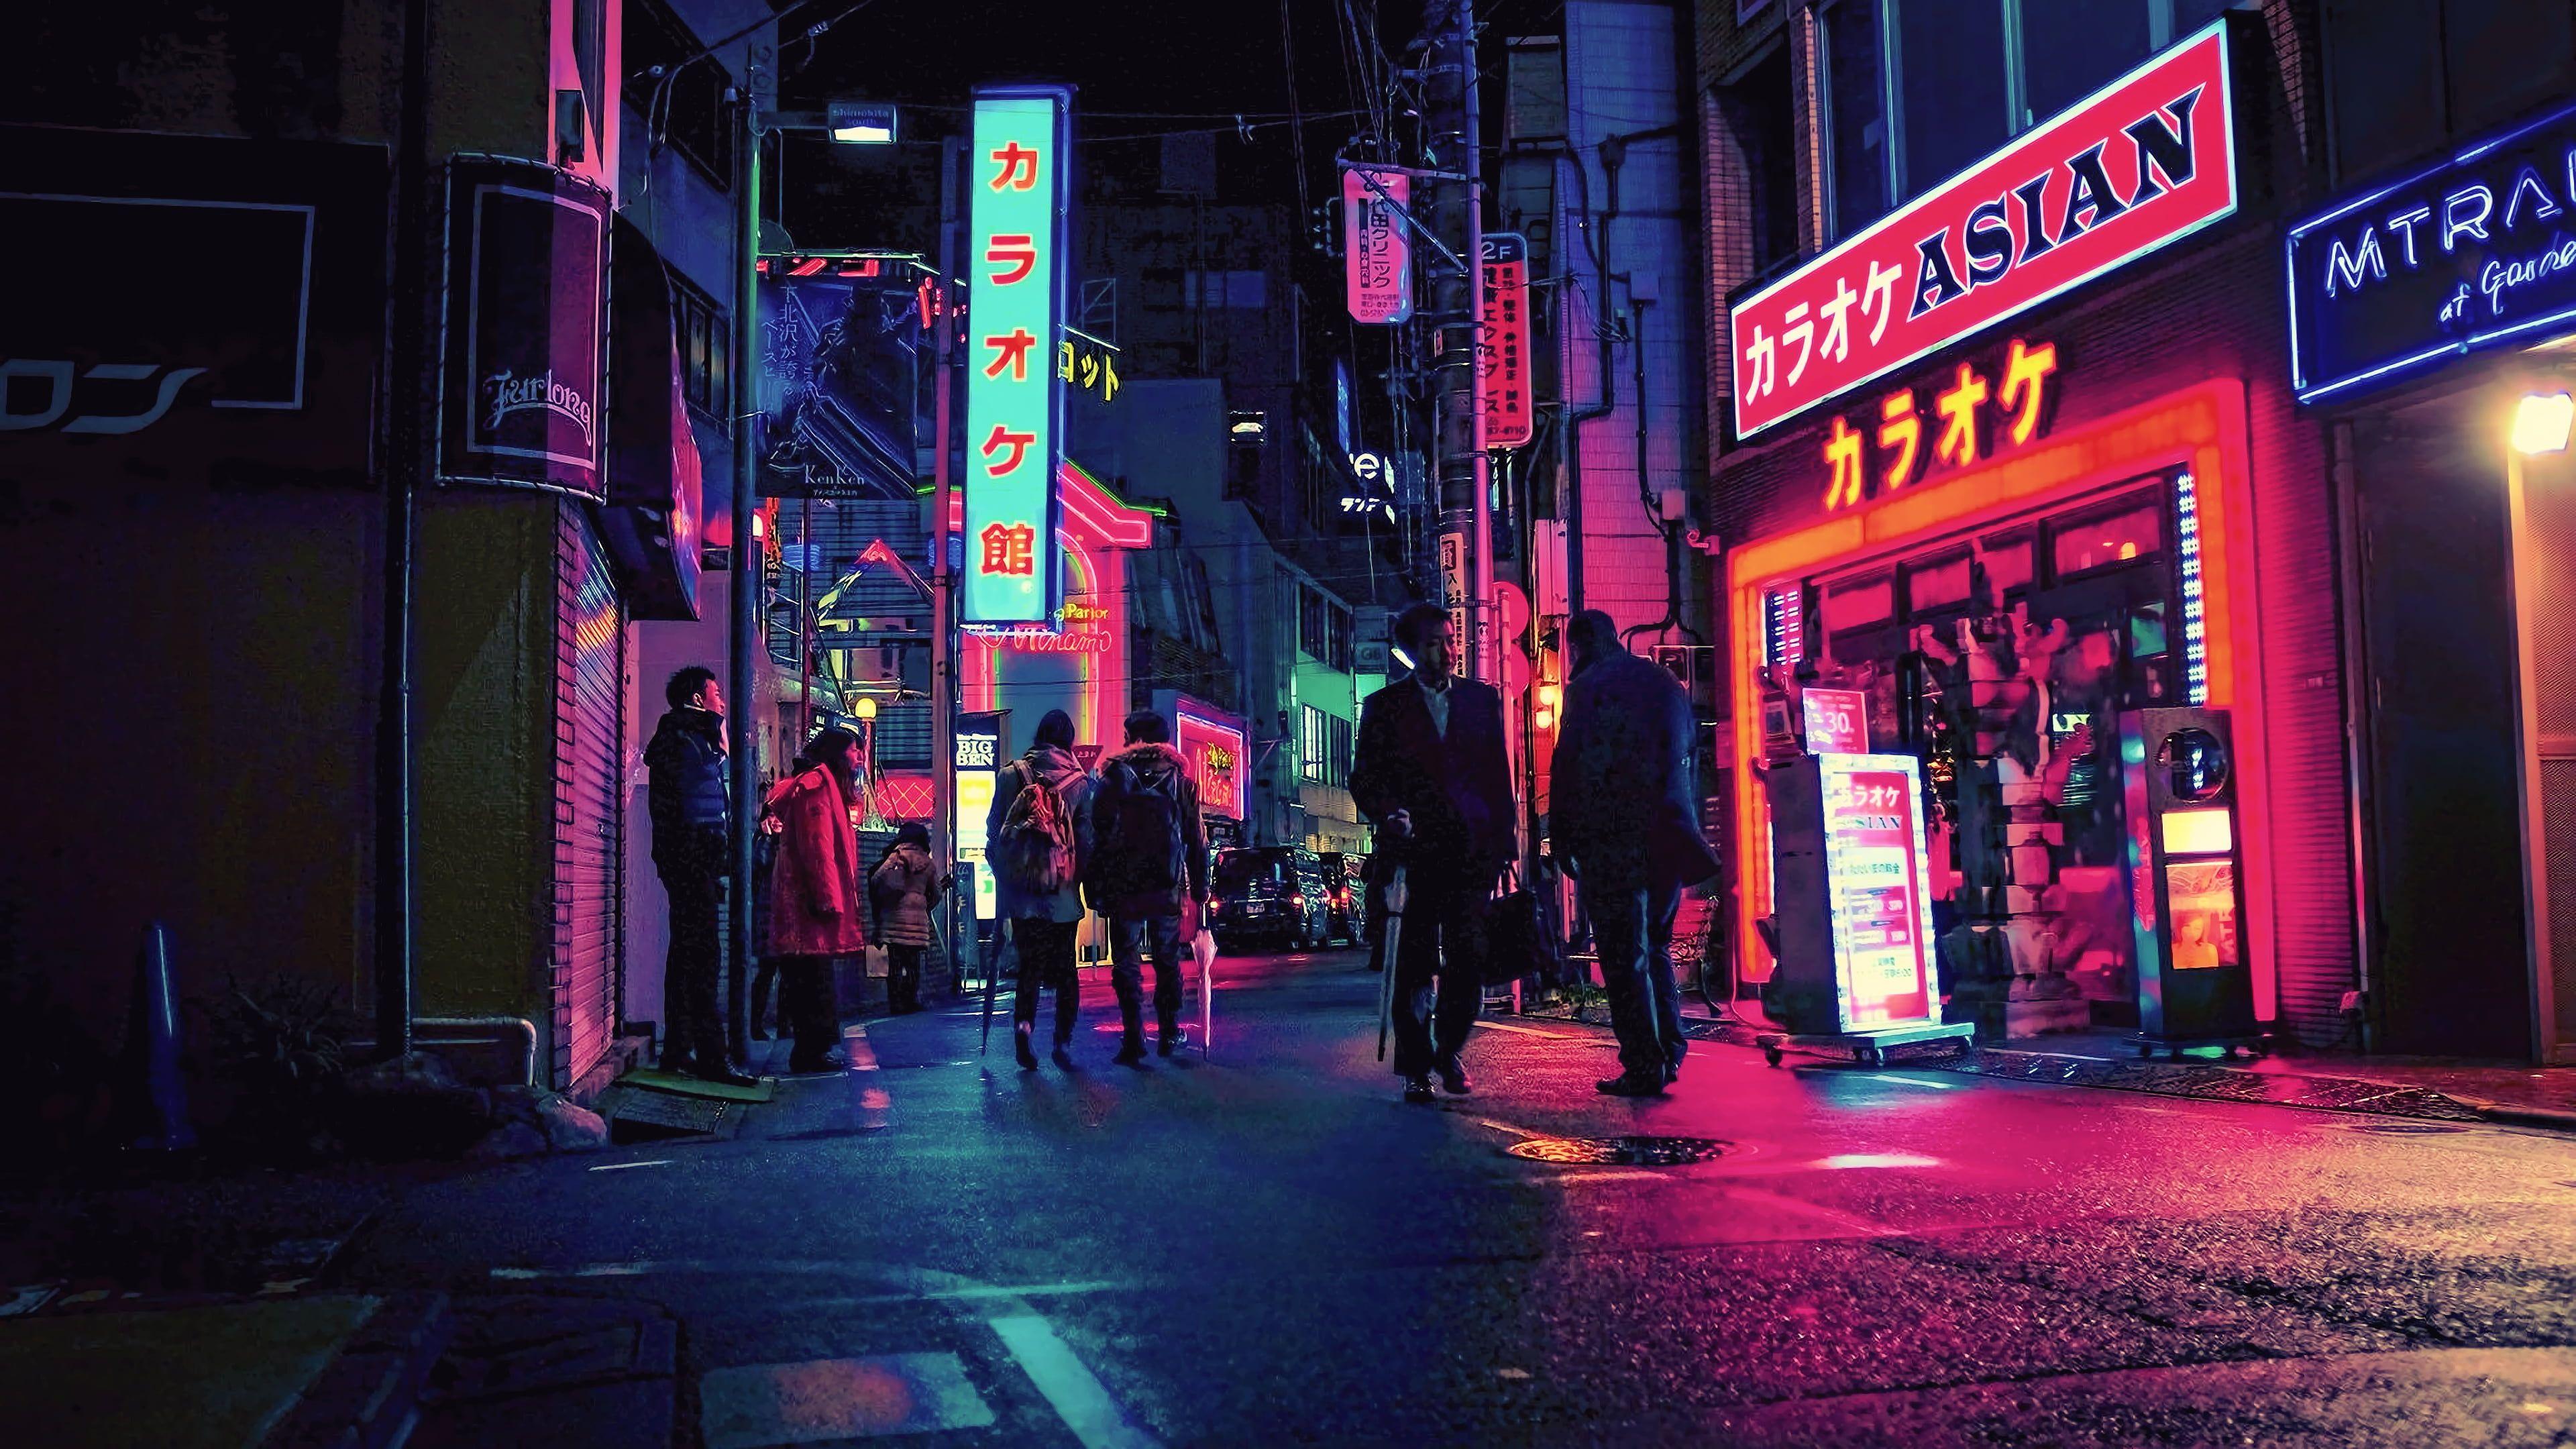 Night Japan City Street Neon 4k Wallpaper Hdwallpaper Desktop In 2020 Neon Wallpaper Neon Noir Cyberpunk City